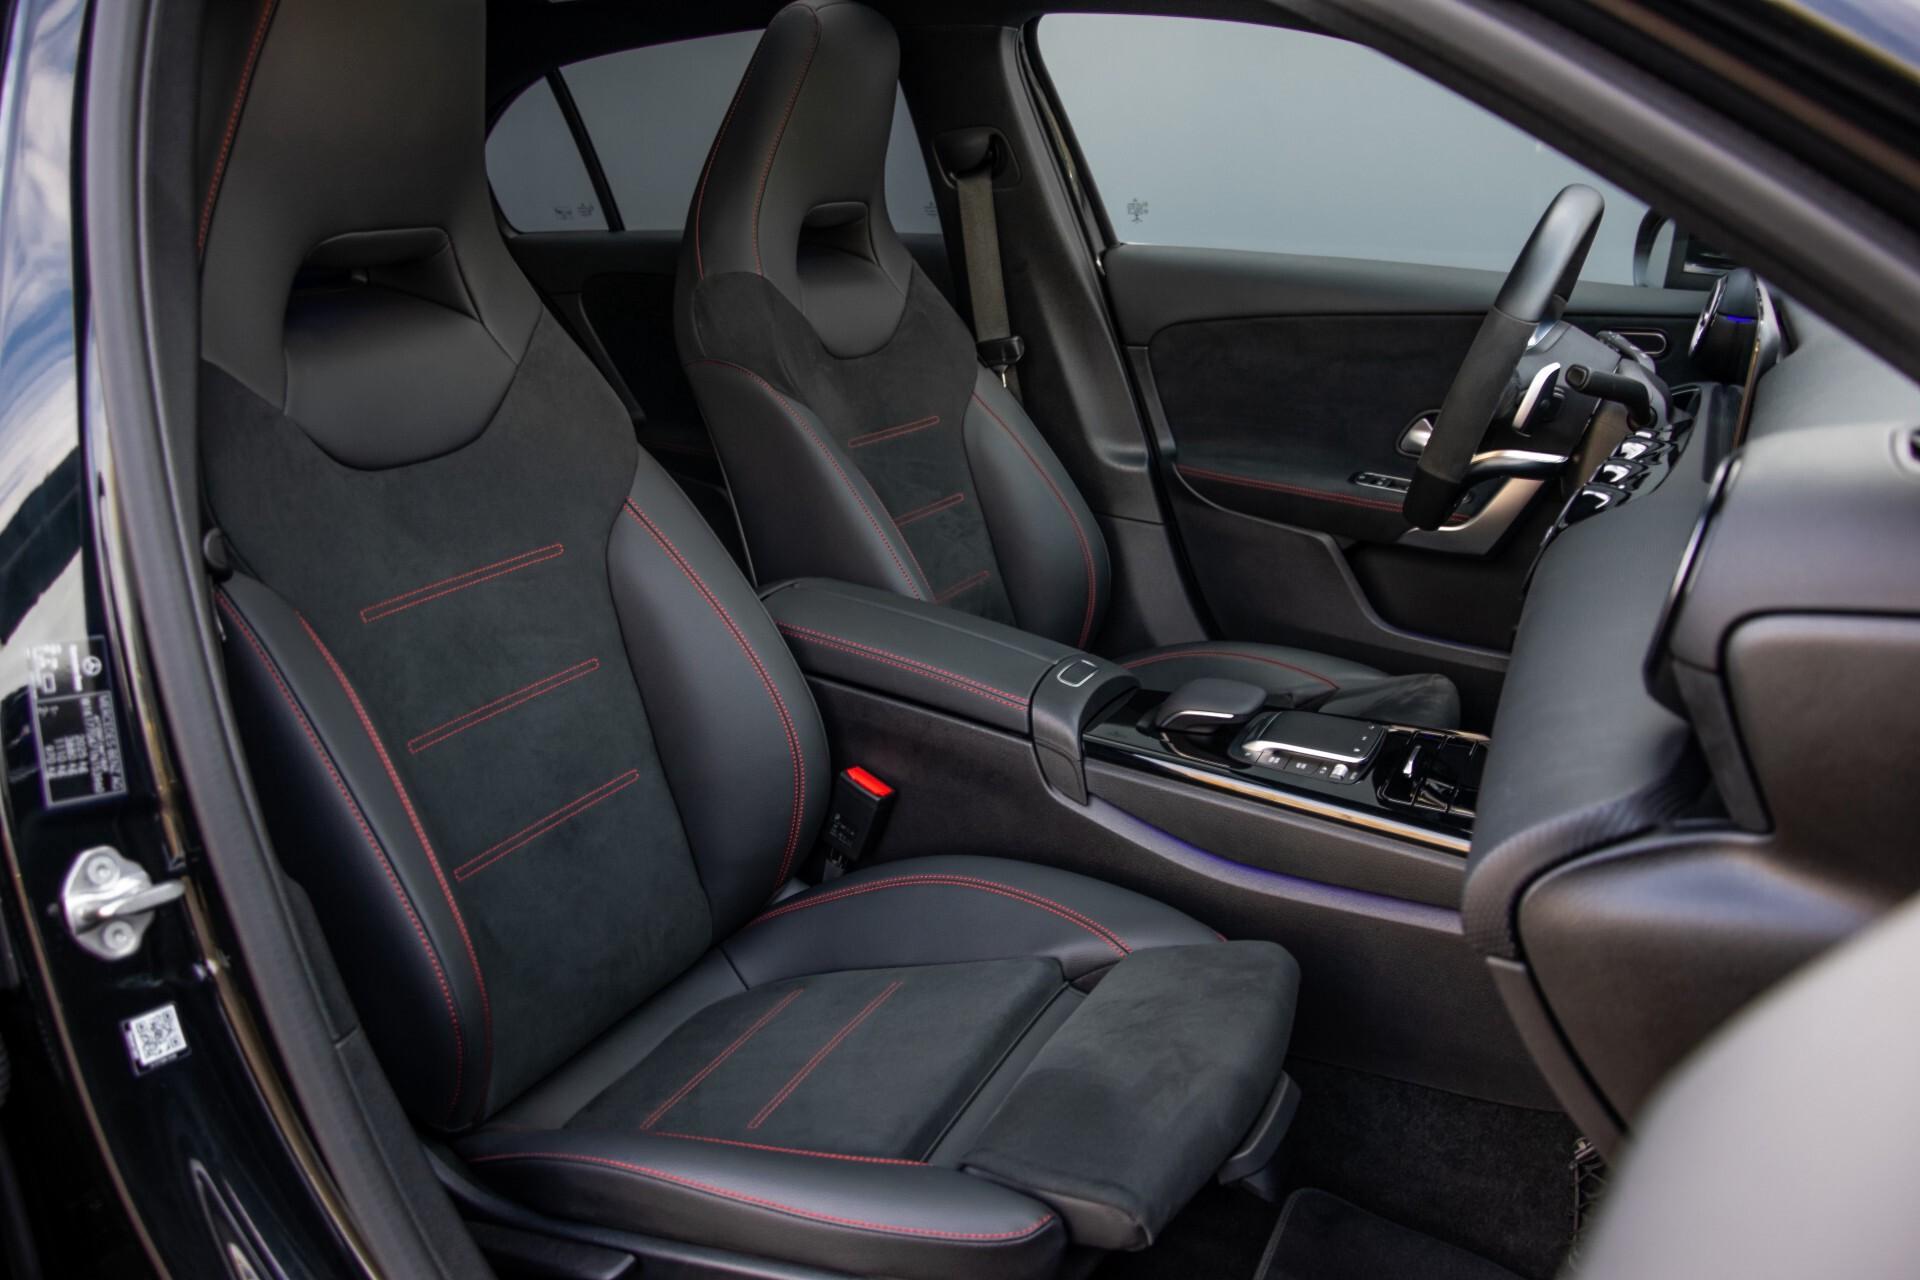 Mercedes-Benz A-Klasse 250 4-M AMG Panorama/Keyless-Entry/MBUX/HUD/Burmester/360/Multibeam LED Aut7 Foto 3